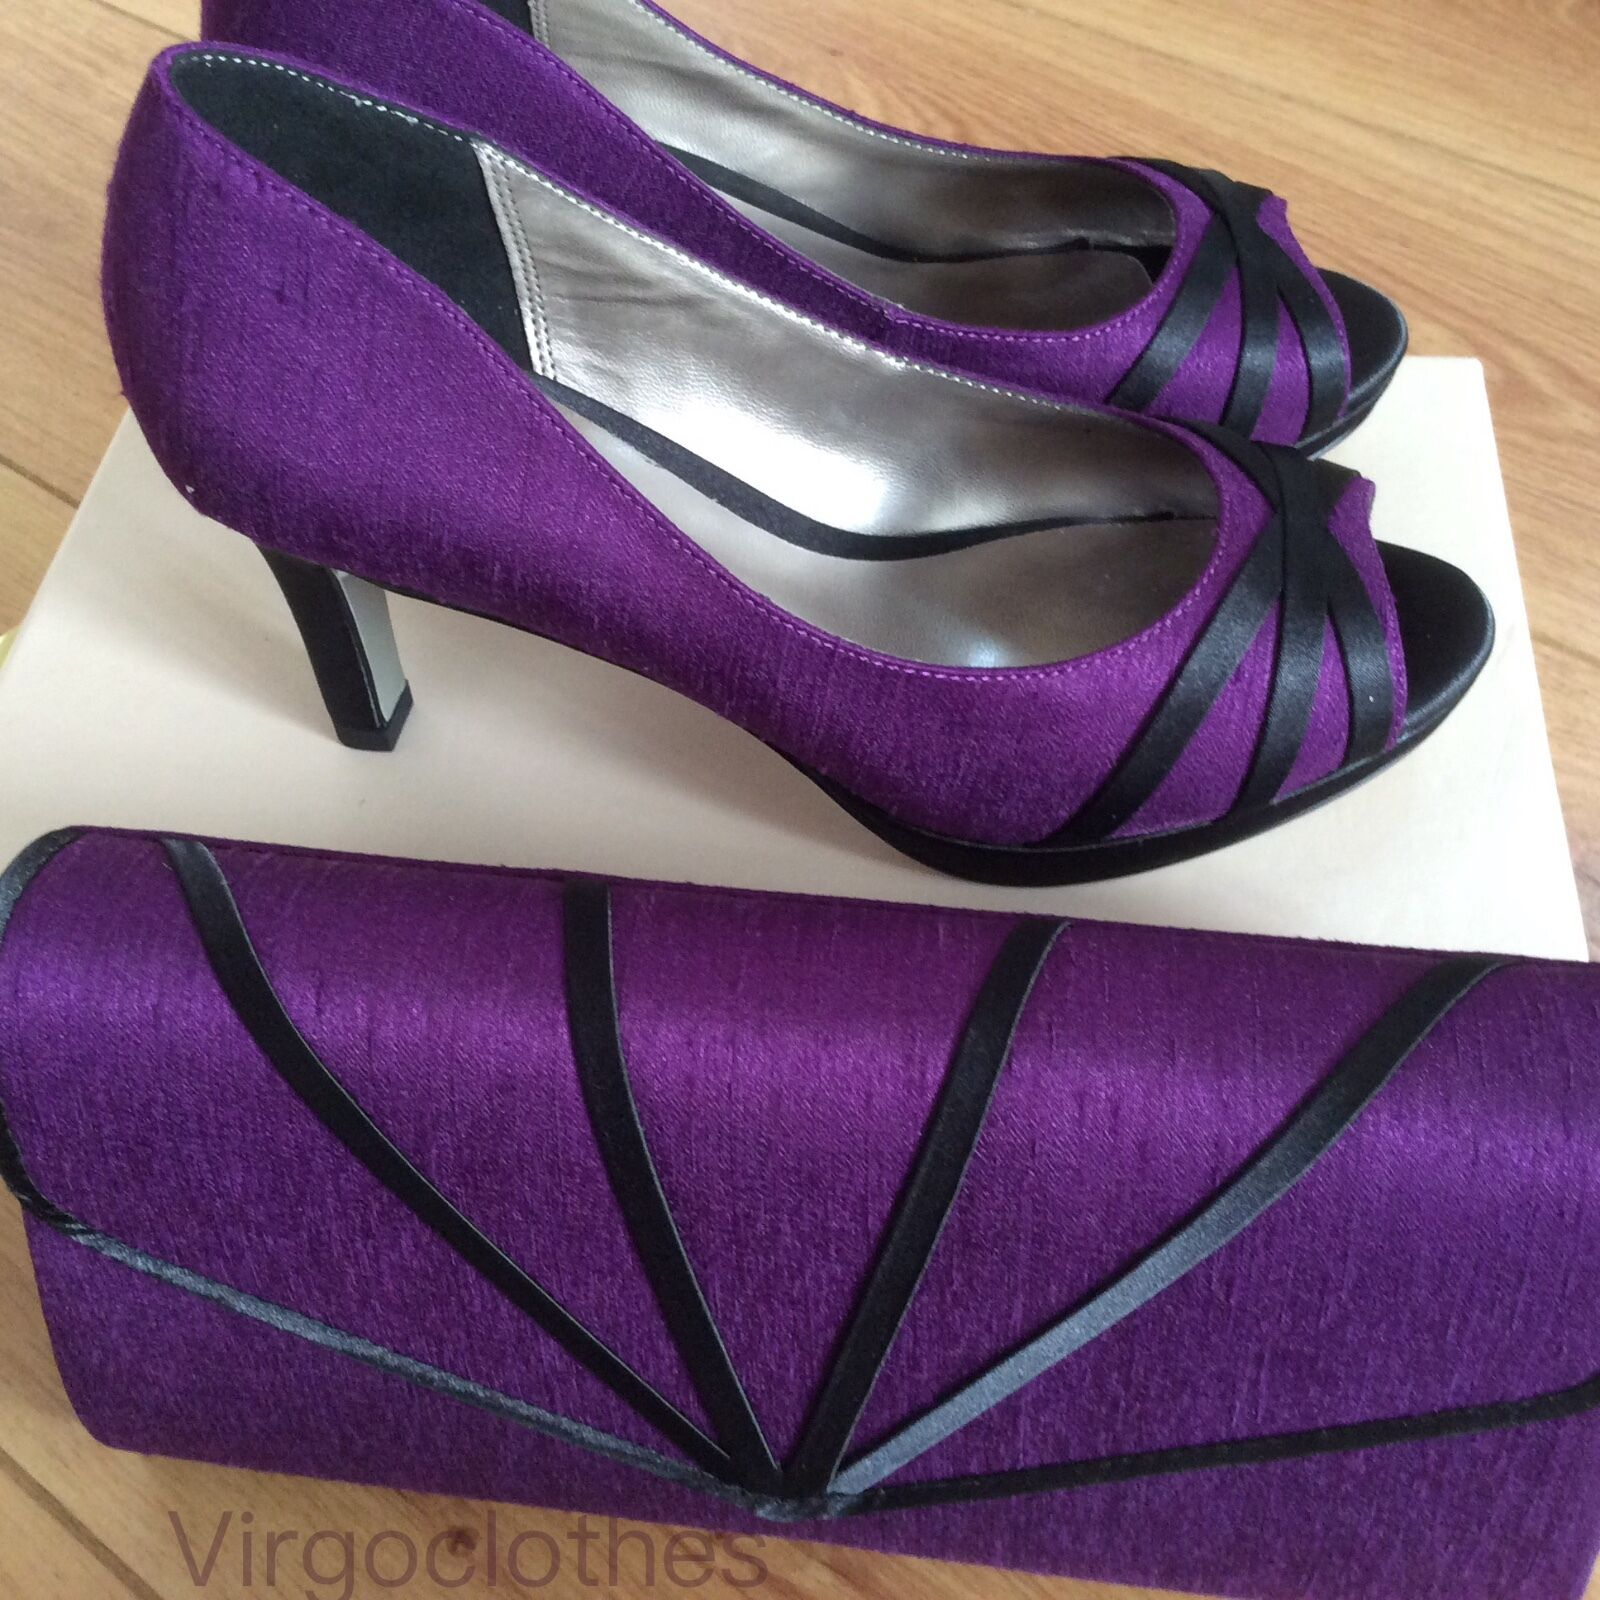 NEW - Jacques Vert Byzantium Range, violet chaussures Taille 3 & Handbag,